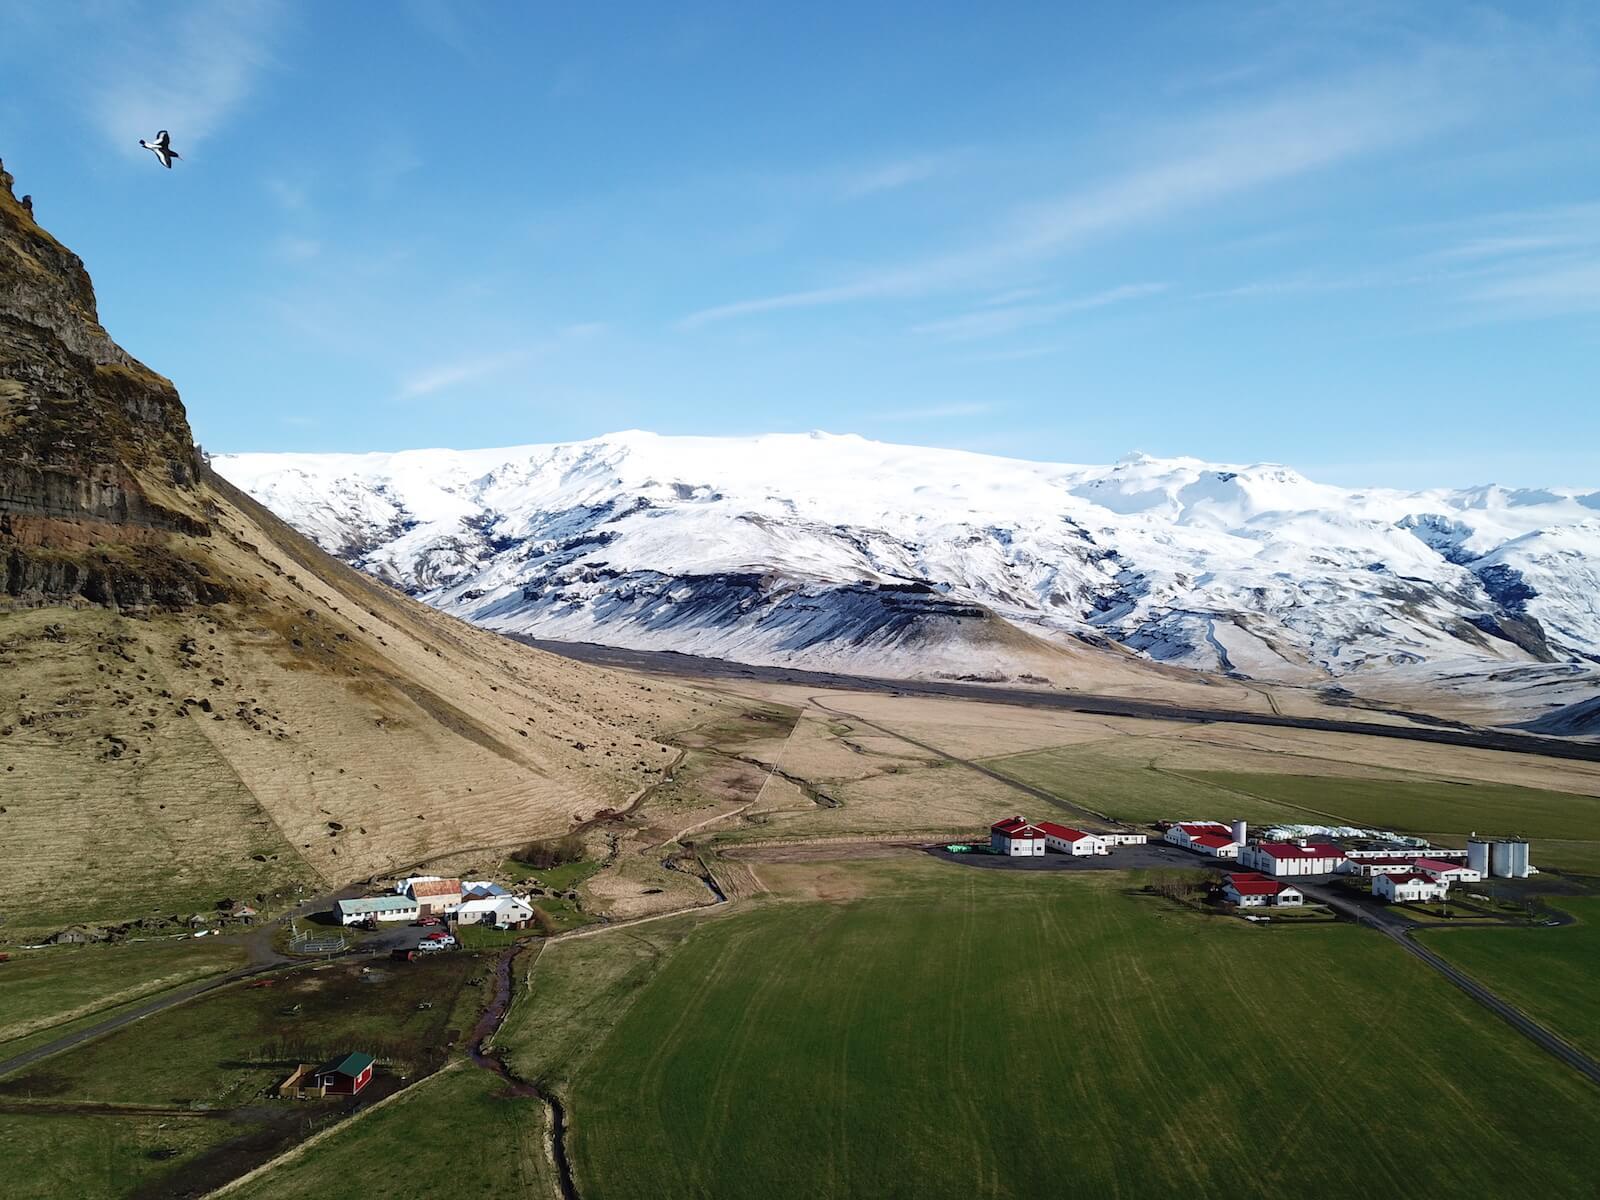 beste reistijd ijsland april t/m juni